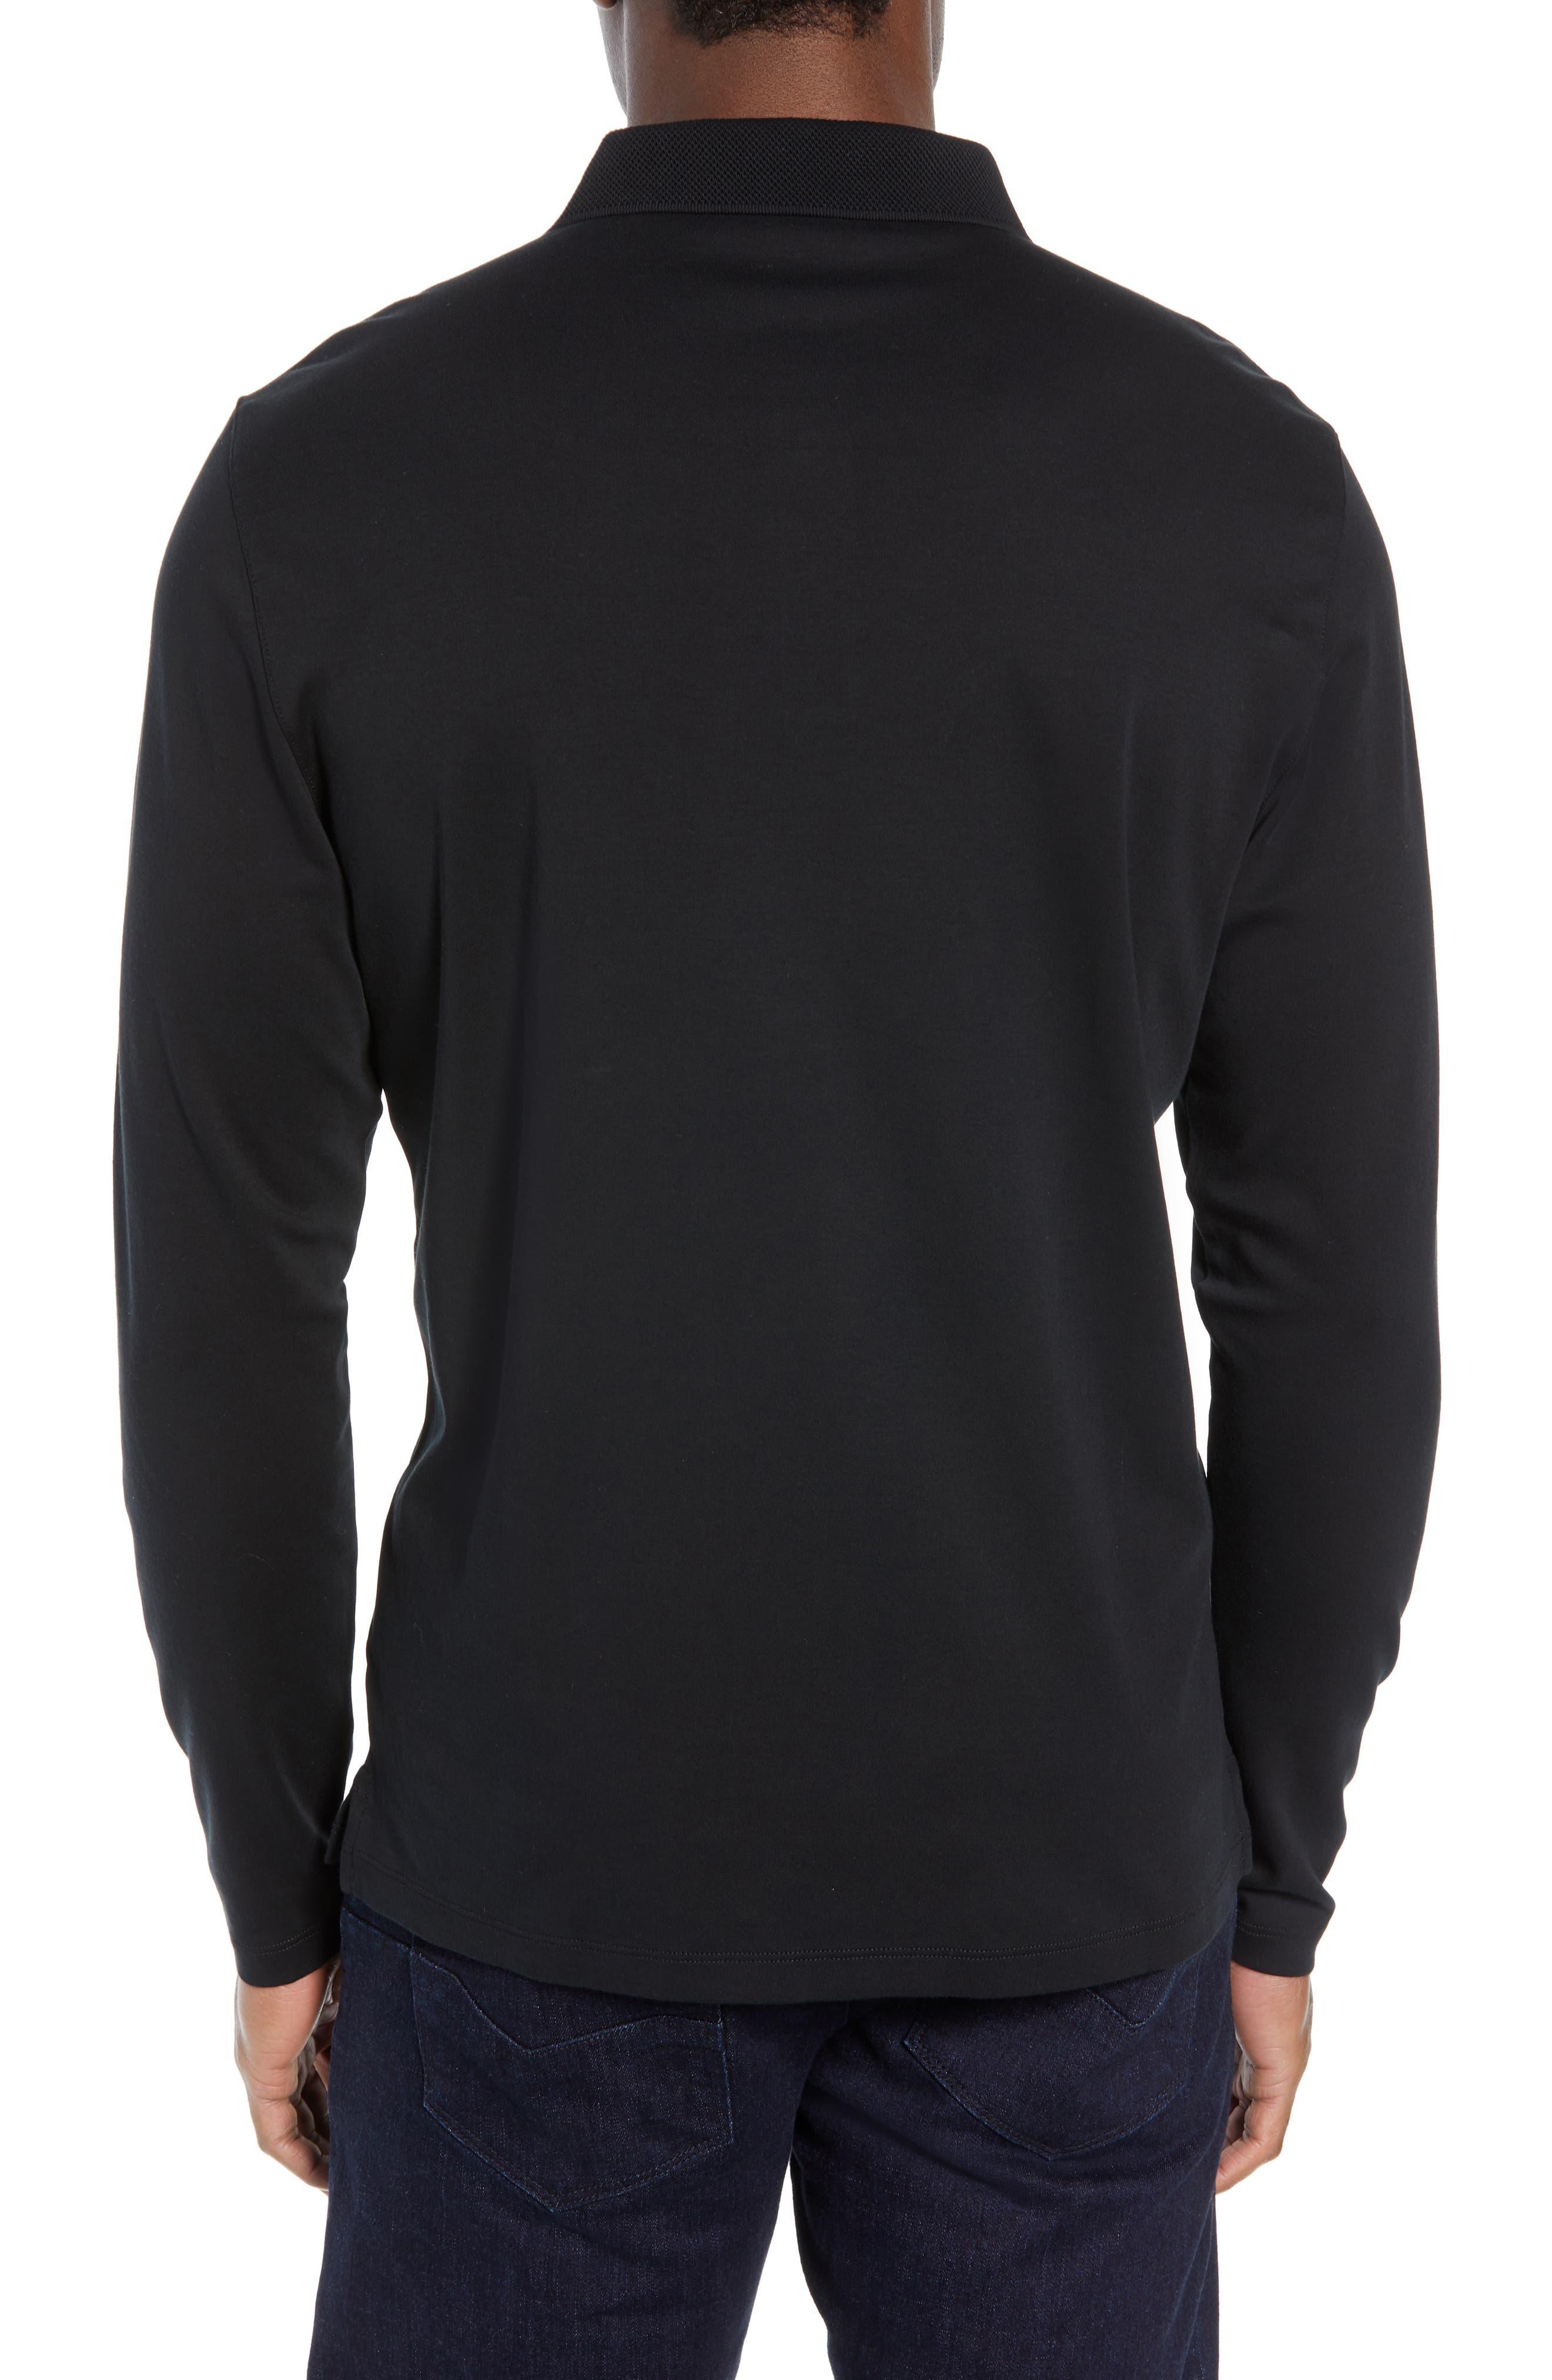 ROBERT BARAKETT, Batiste Long Sleeve Polo, Alternate thumbnail 2, color, BLACK